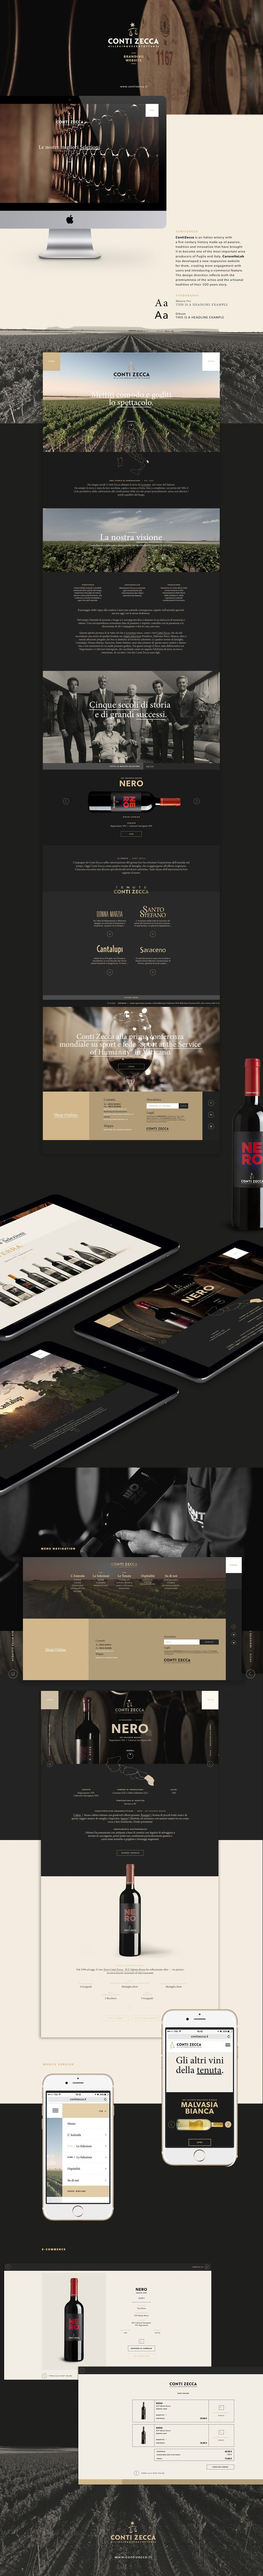 Conti Zecca | Website on Behance